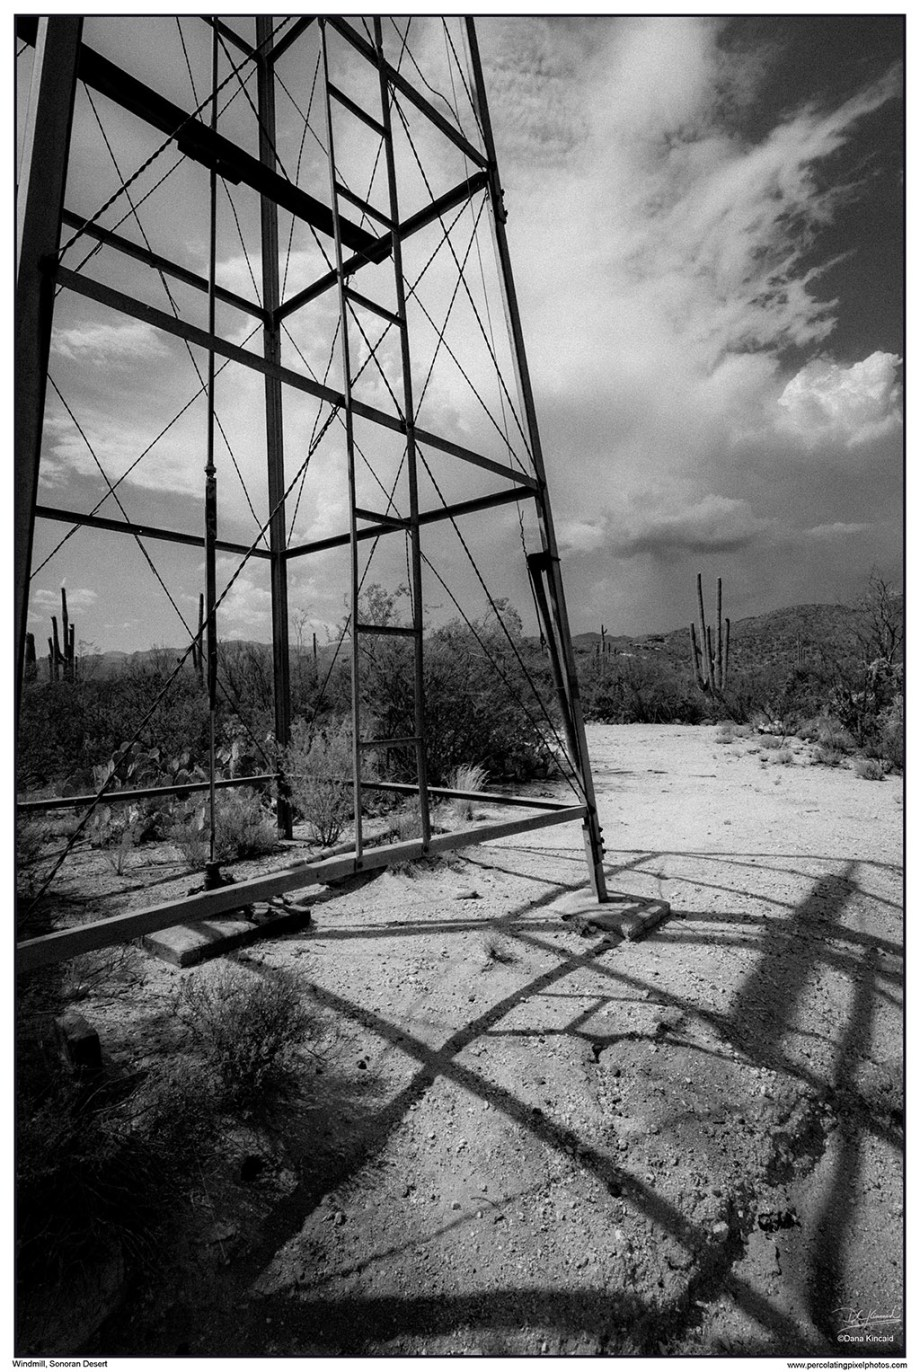 Windmill in the Sonoran Desert